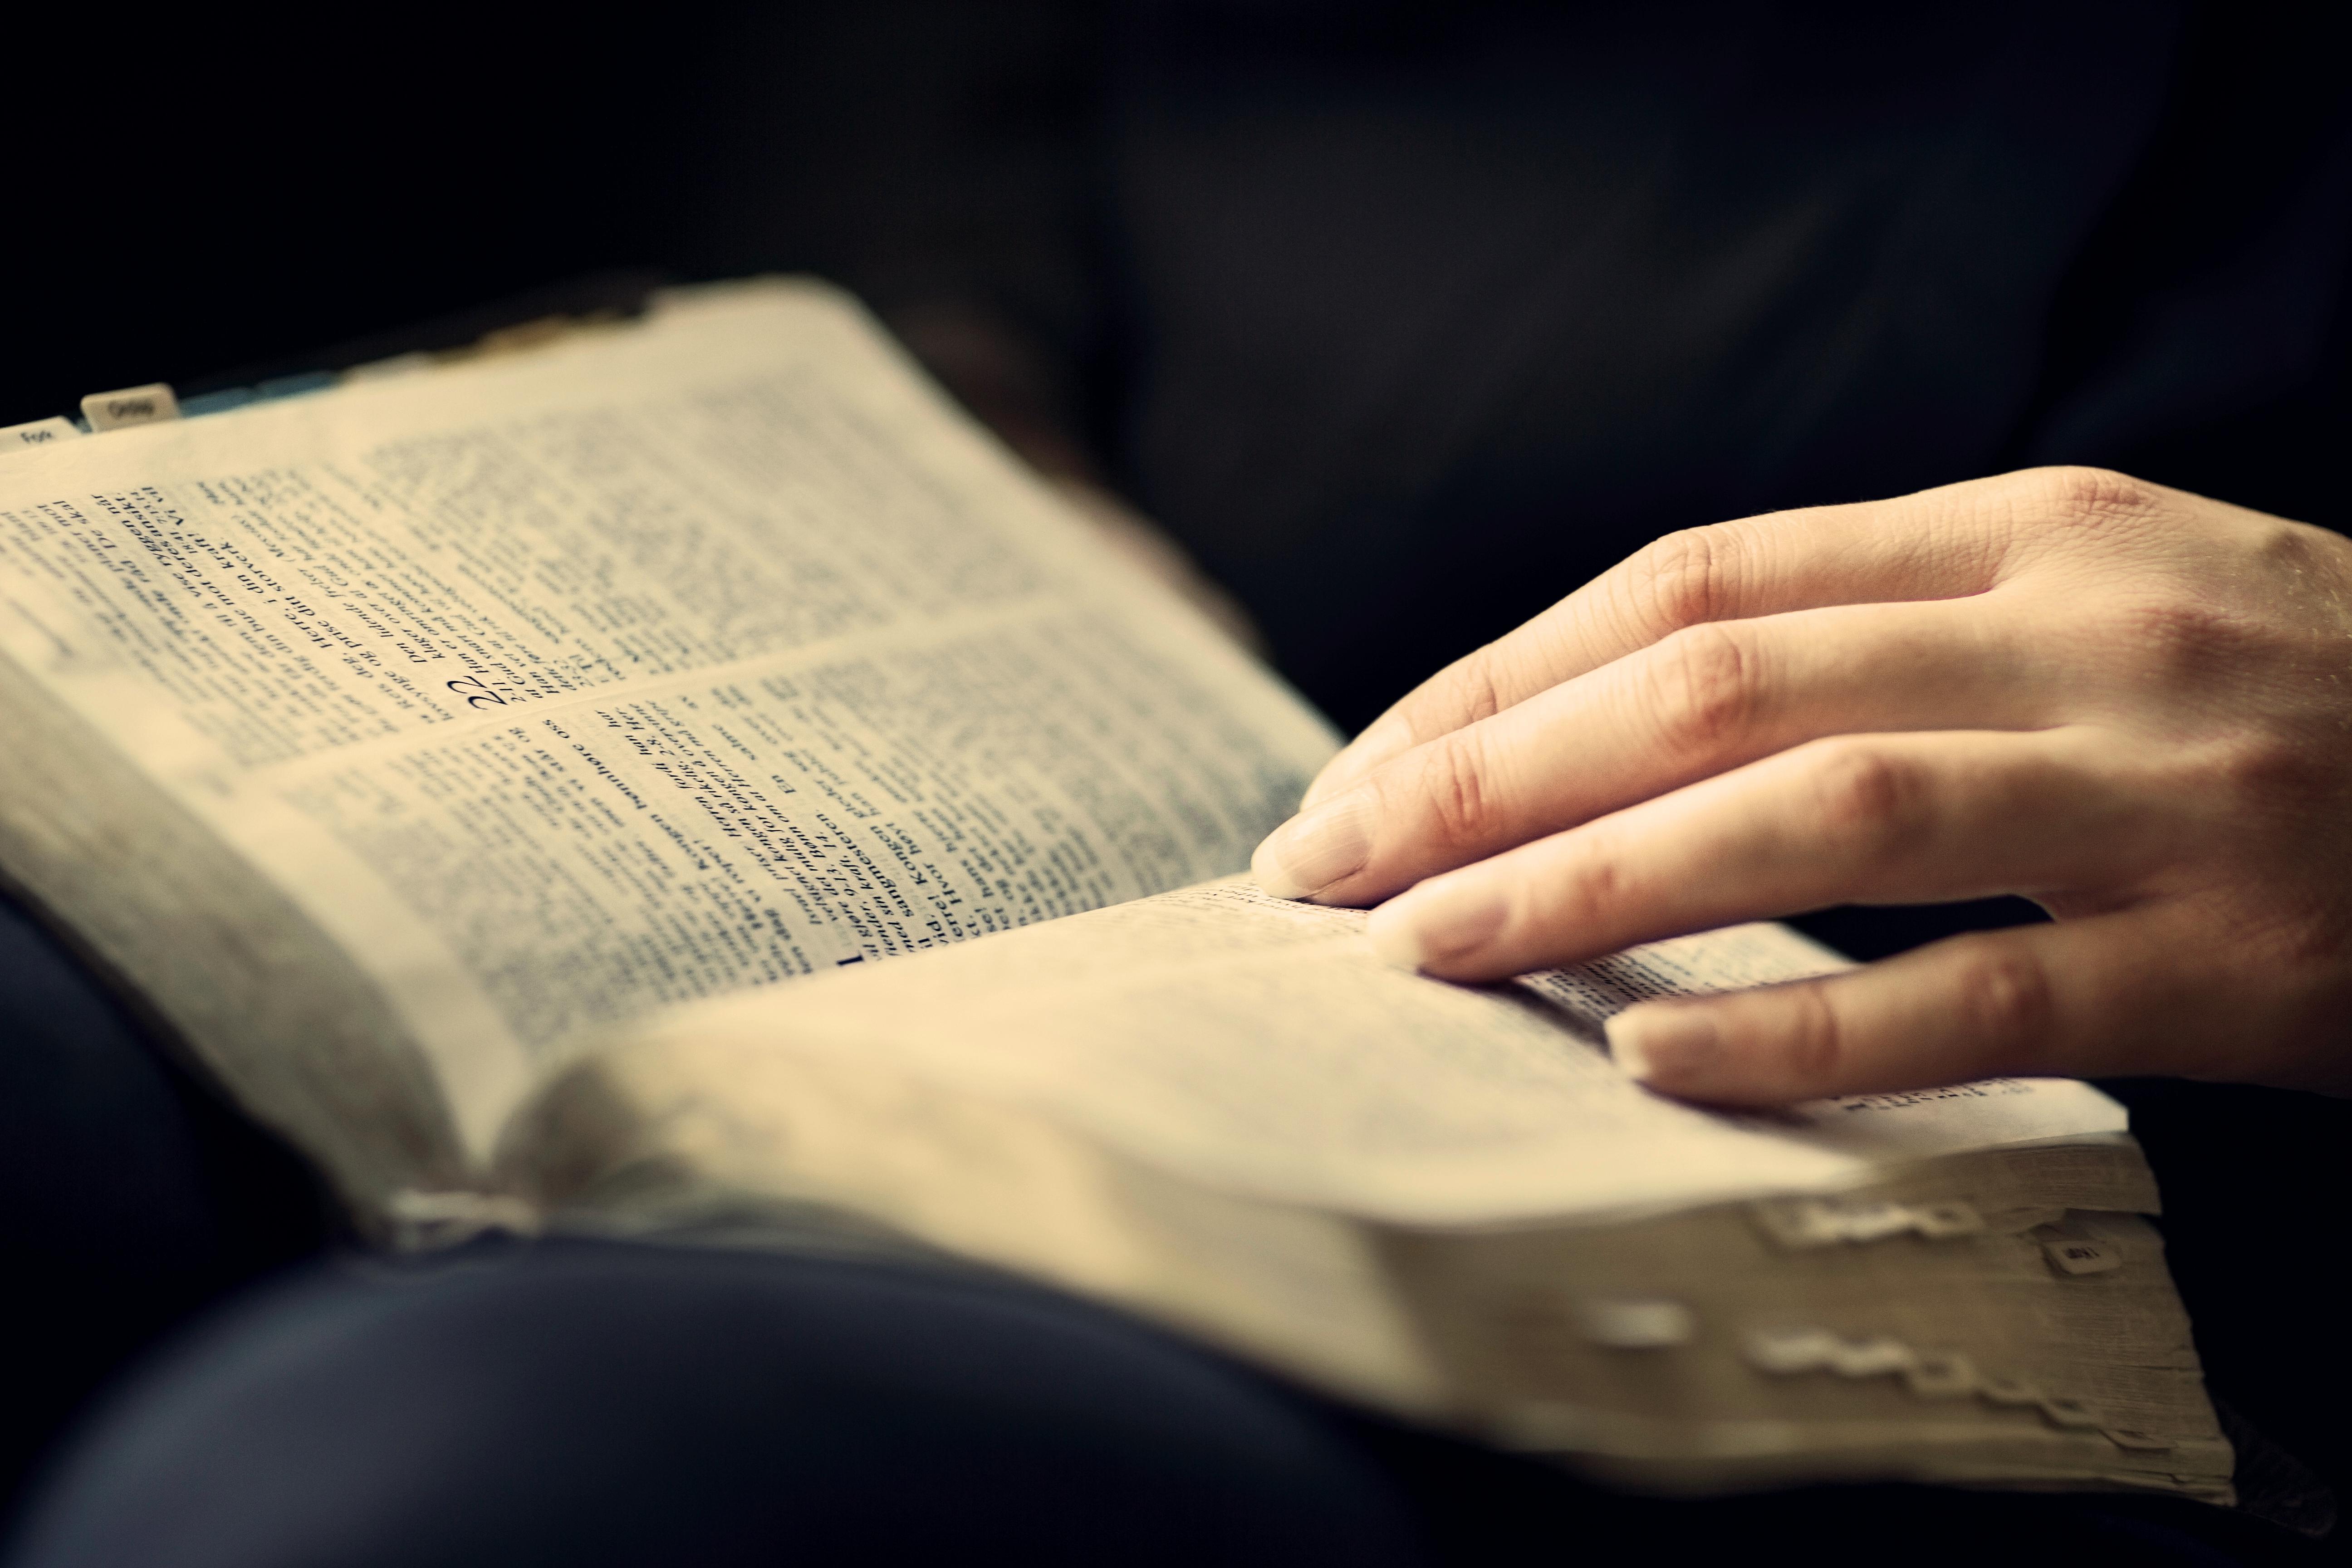 """Púlpito Vivo"" motiva estudo aprofundado da Bíblia Sagrada."